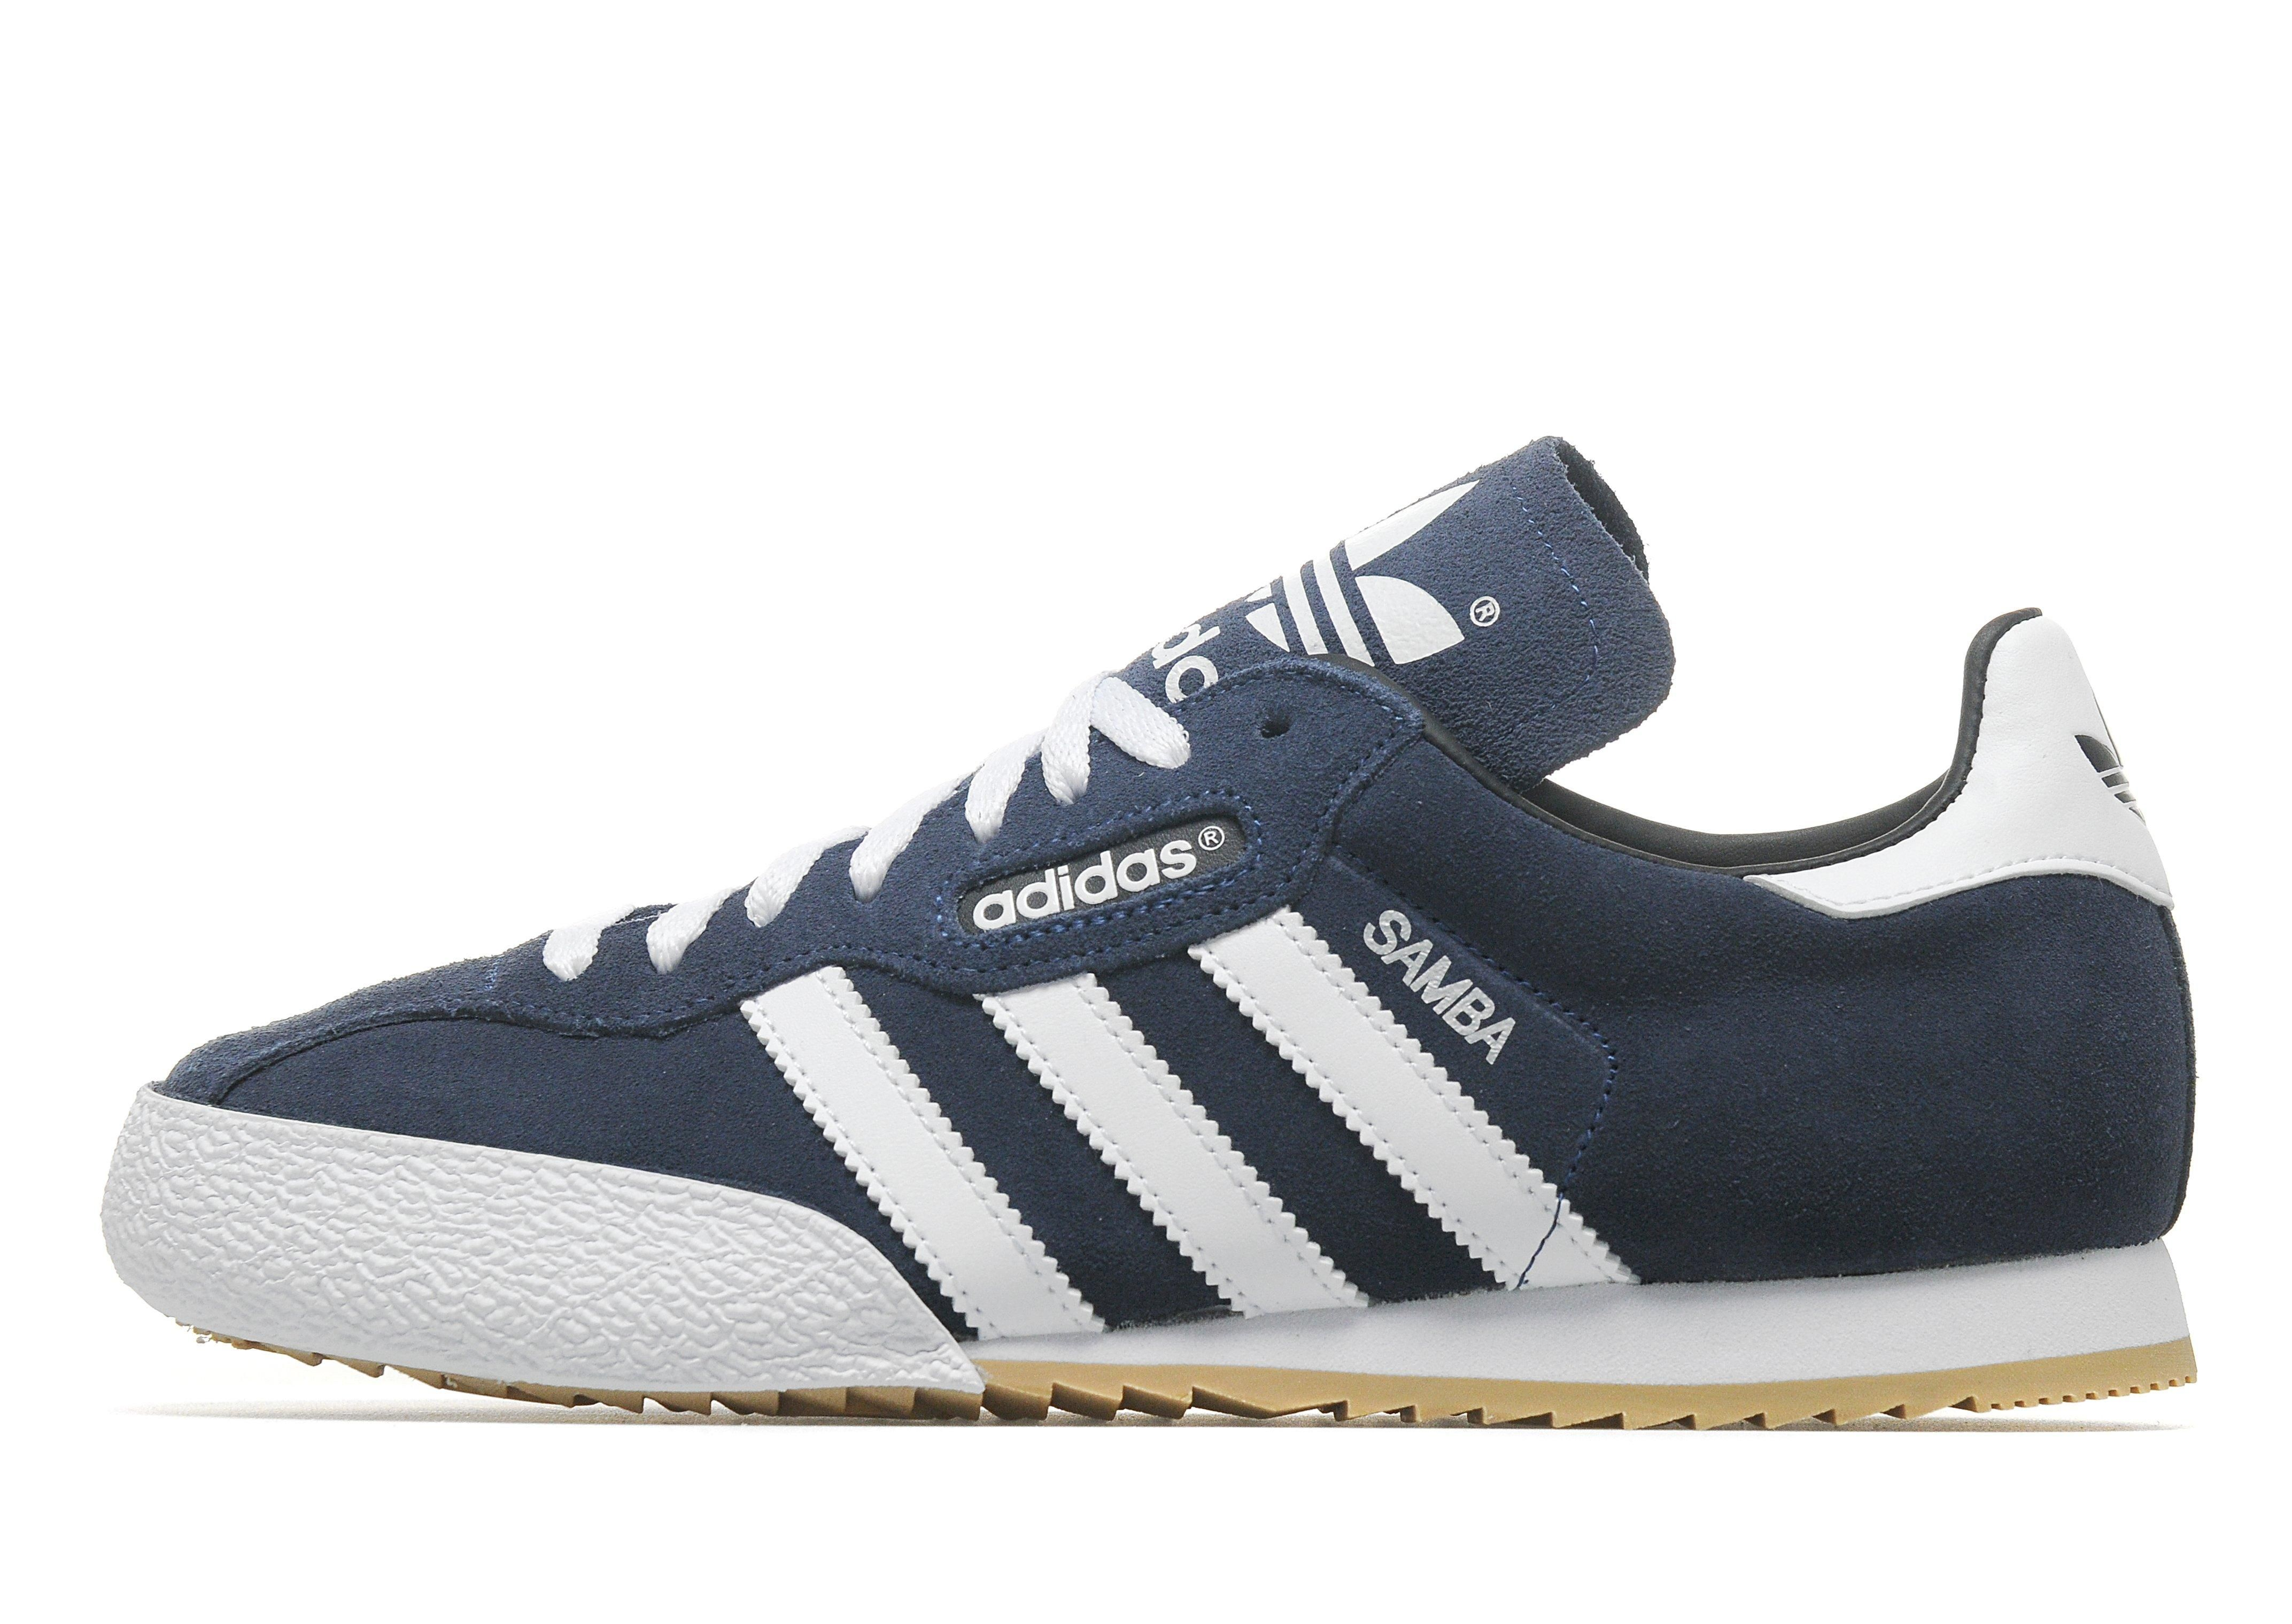 Adidas samba trainers, Adidas shoes mens